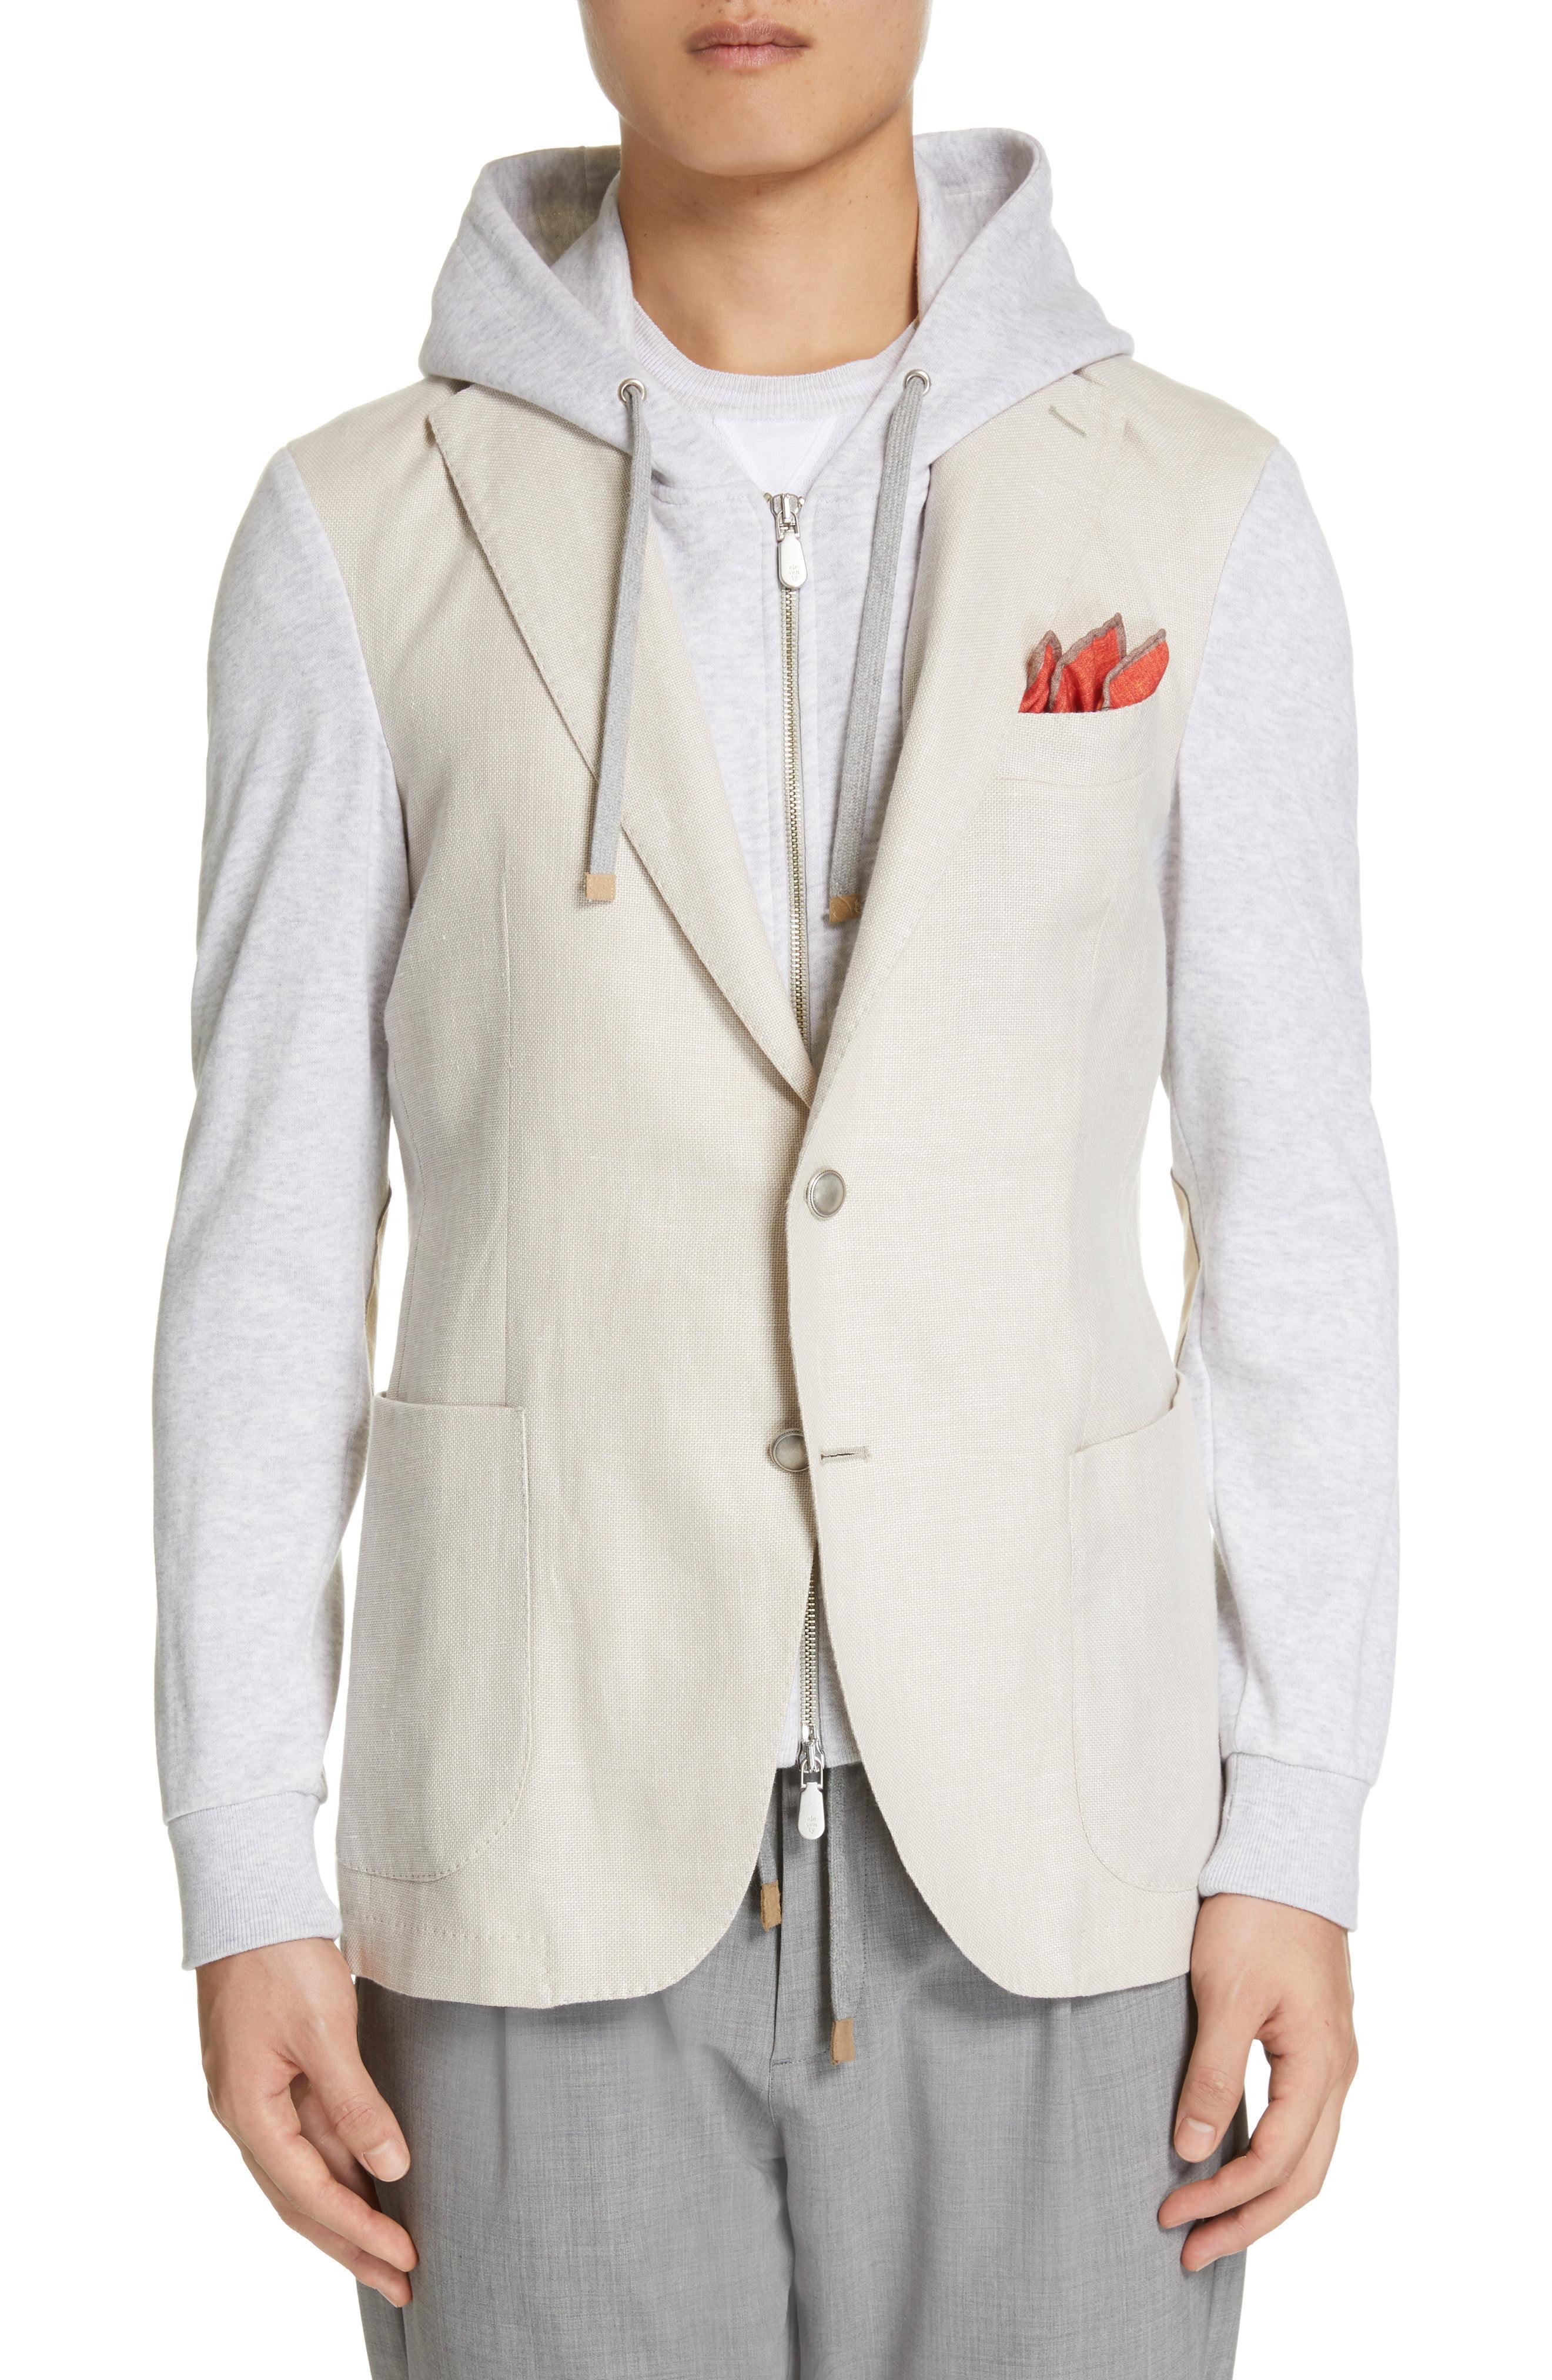 96dc0e61b Lyst - Eleventy Trim Fit Mixed Media Hooded Sport Coat for Men